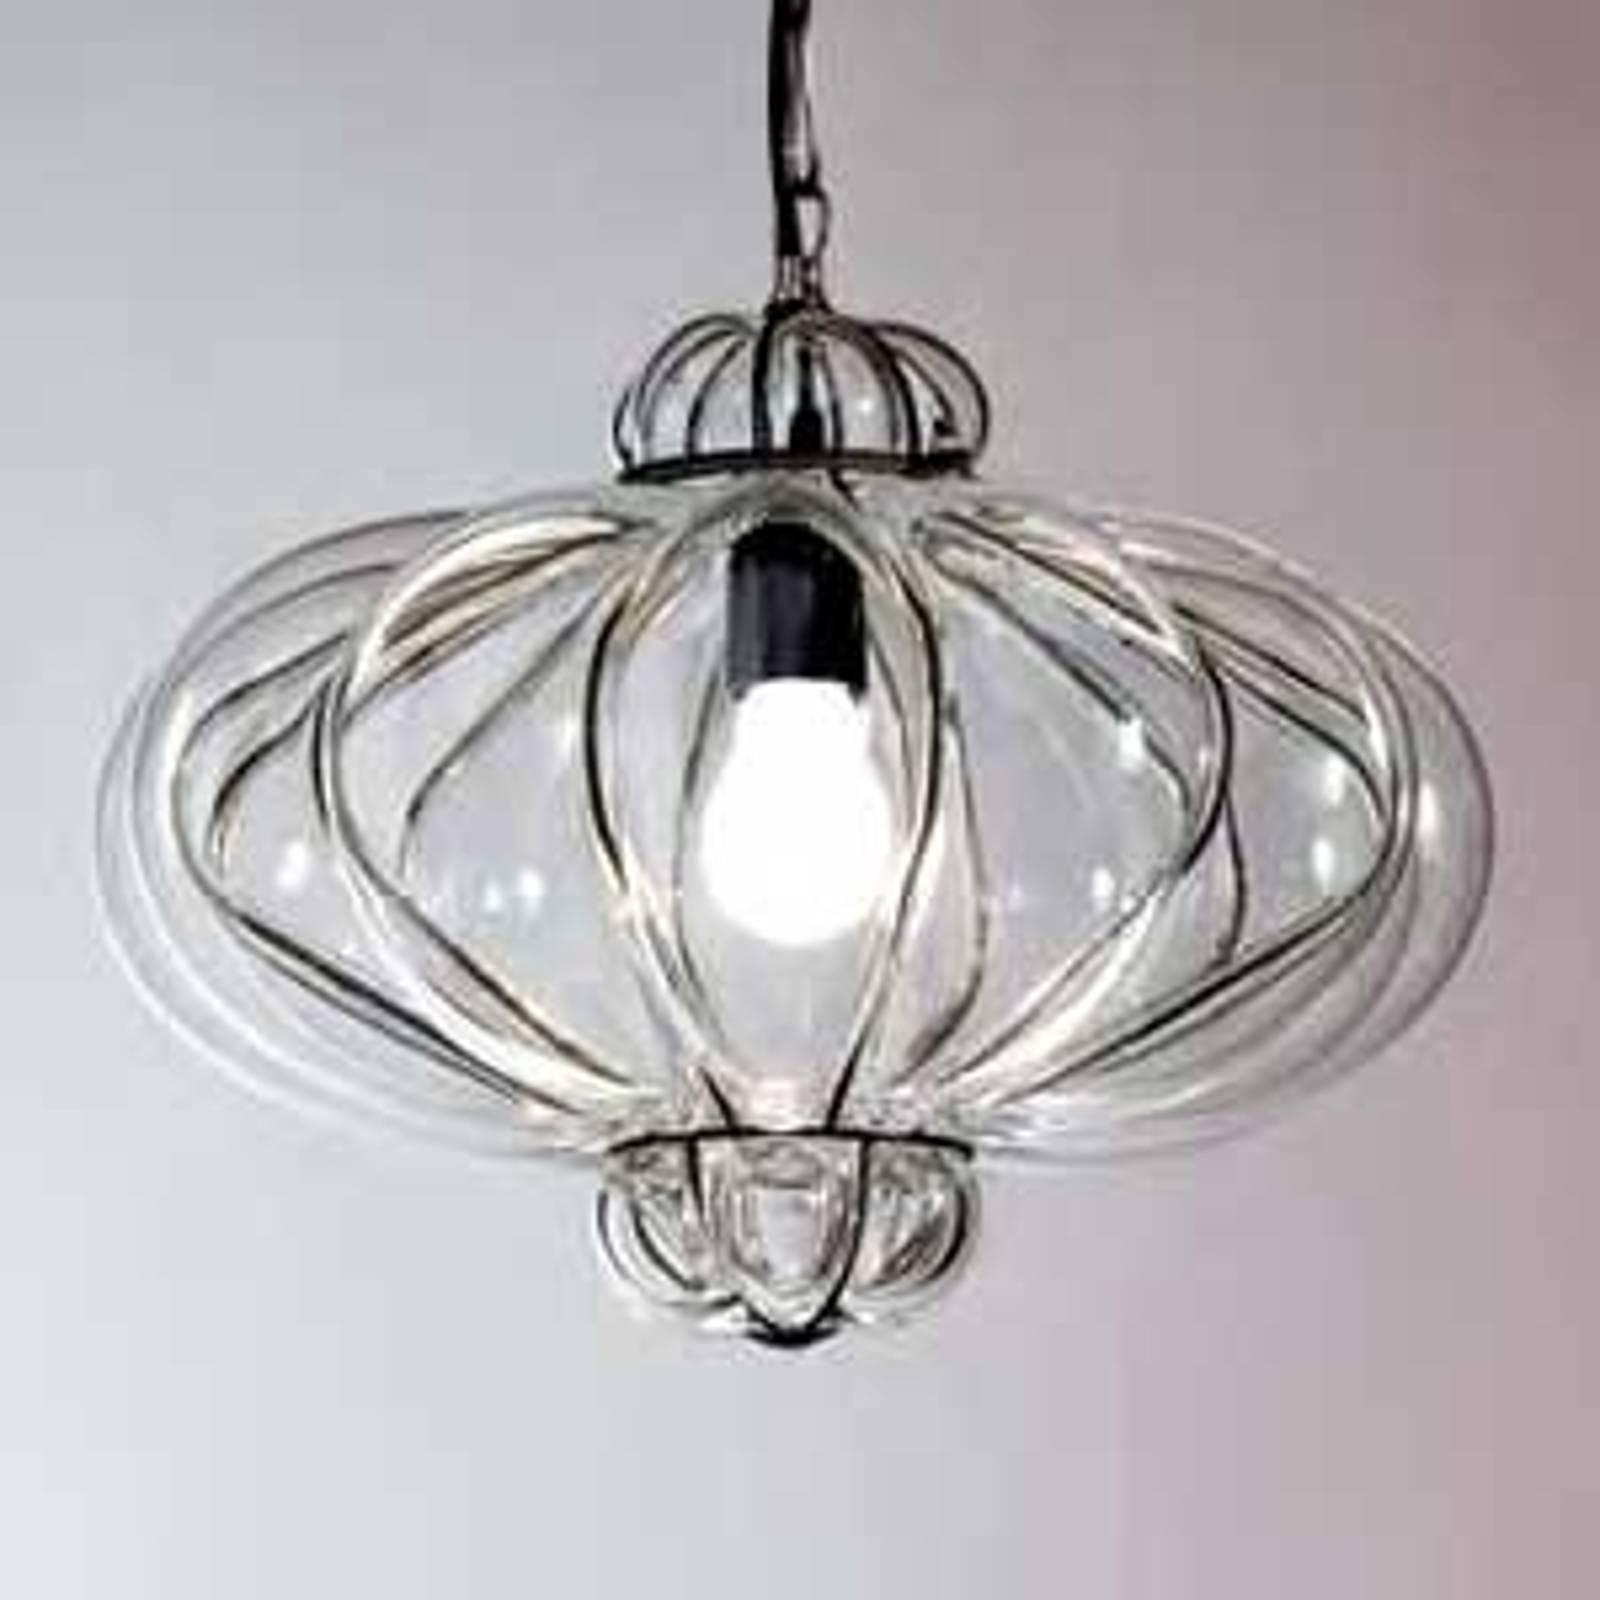 Klassieke hanglamp SULTANO, 42 cm